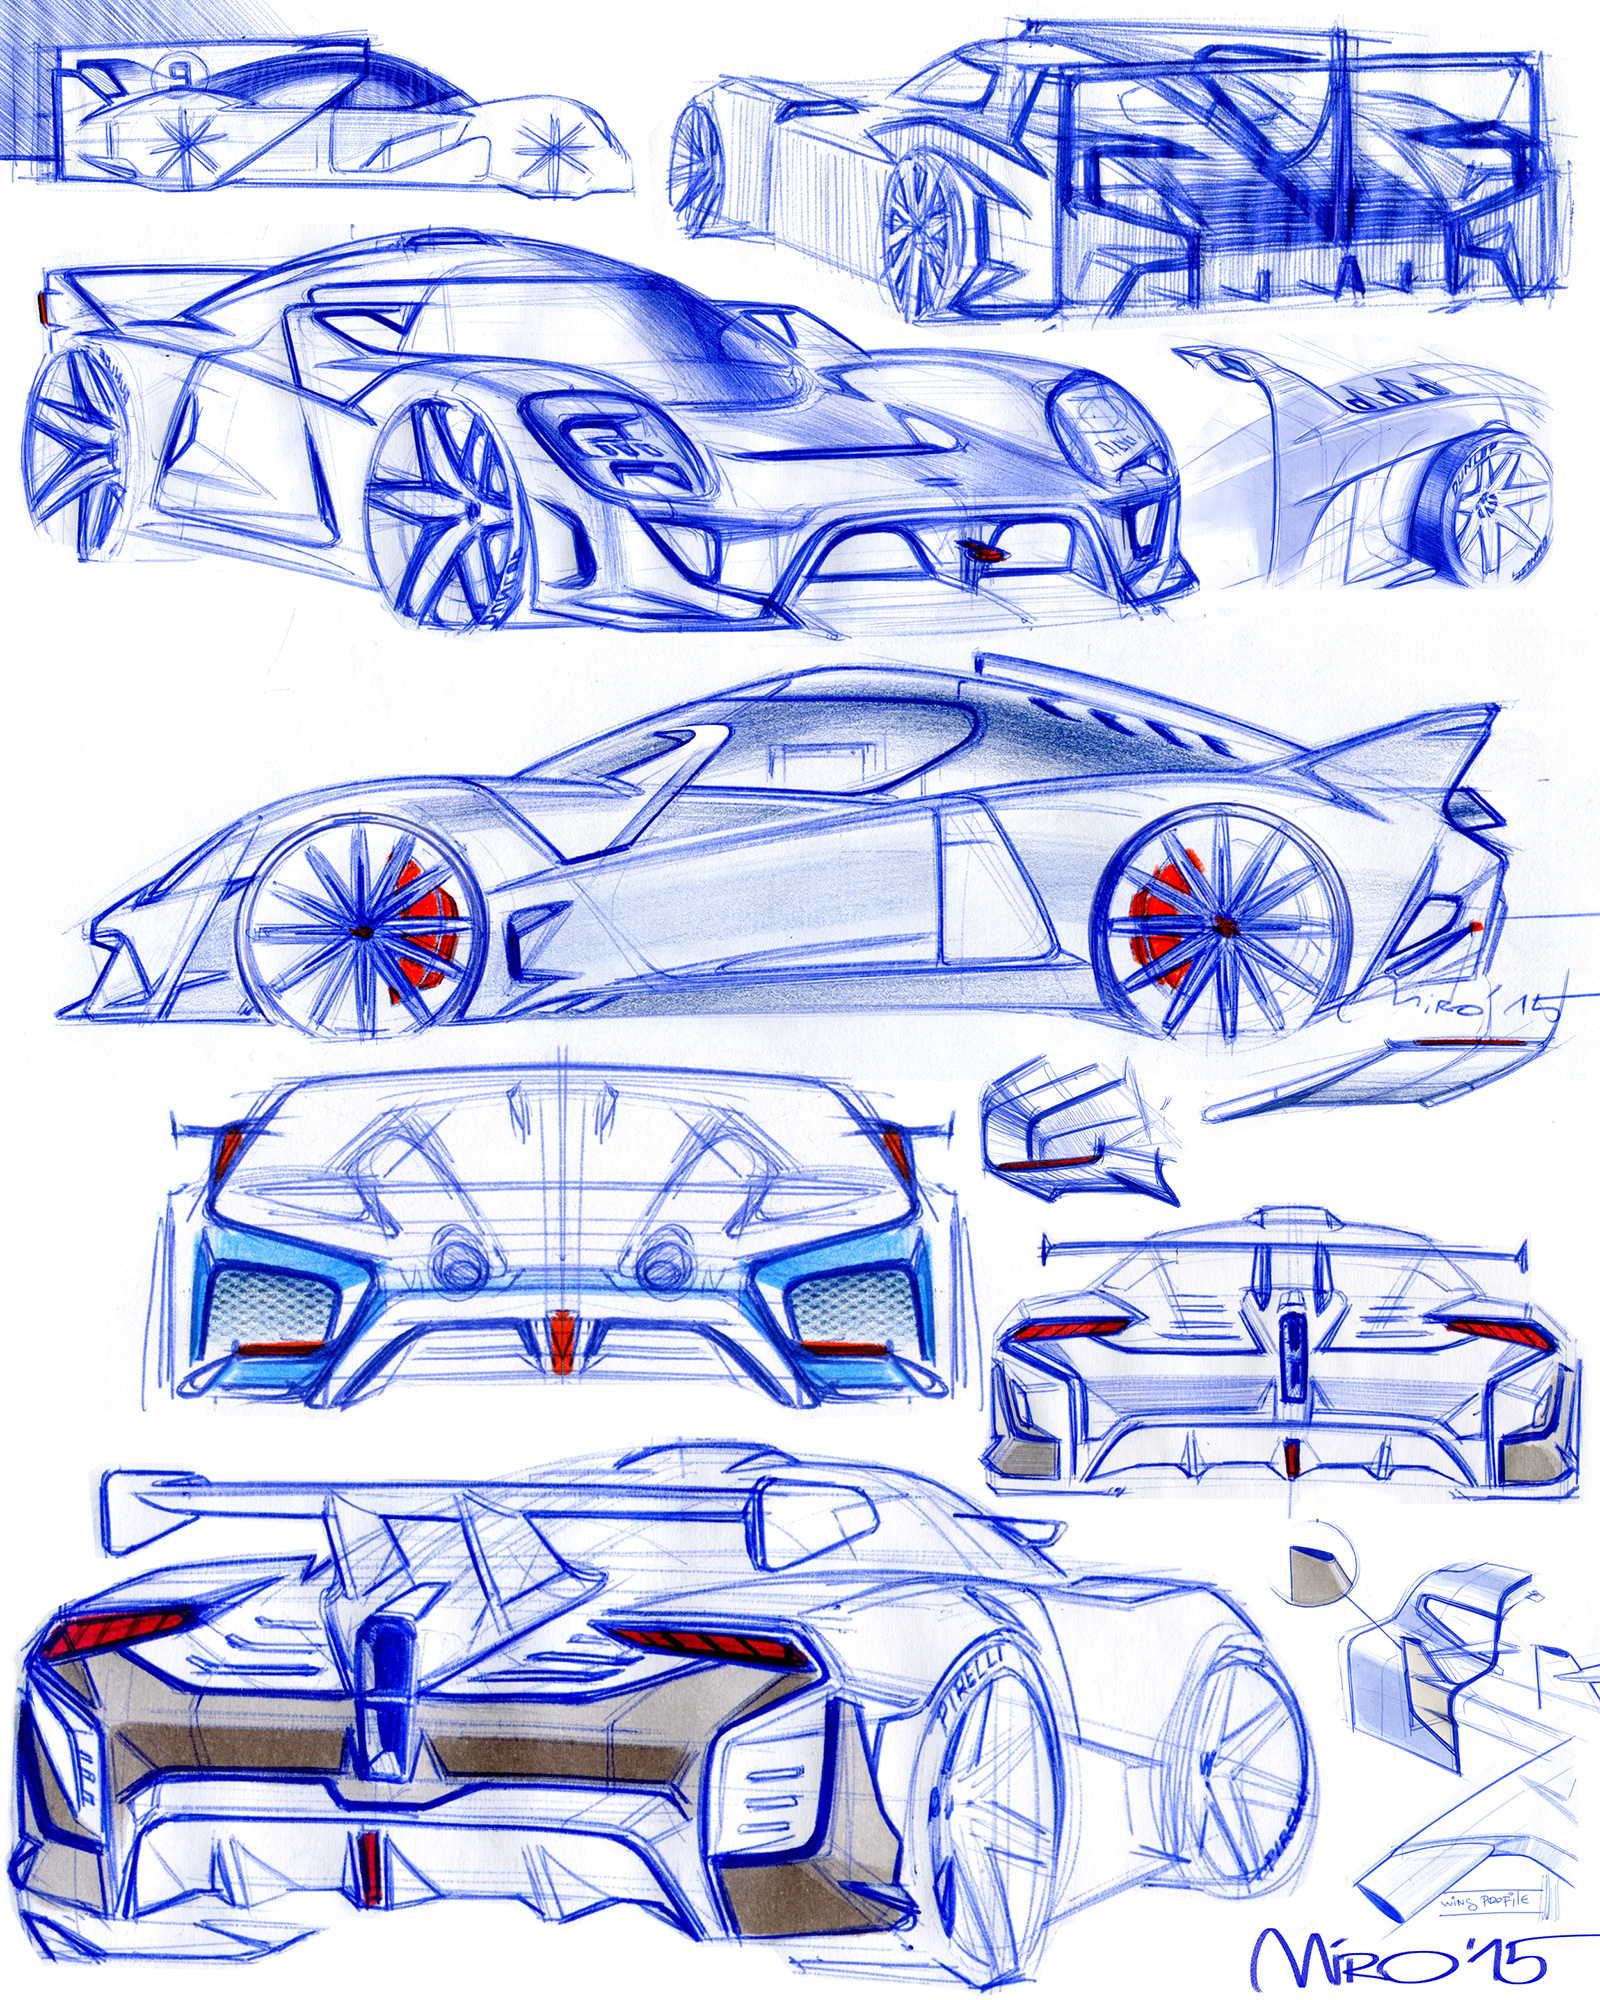 EIDO GTR Concept. Rear End Sketches by Miroslav Dimitrov | Copyright © 2018 Miroslav Dimitrov